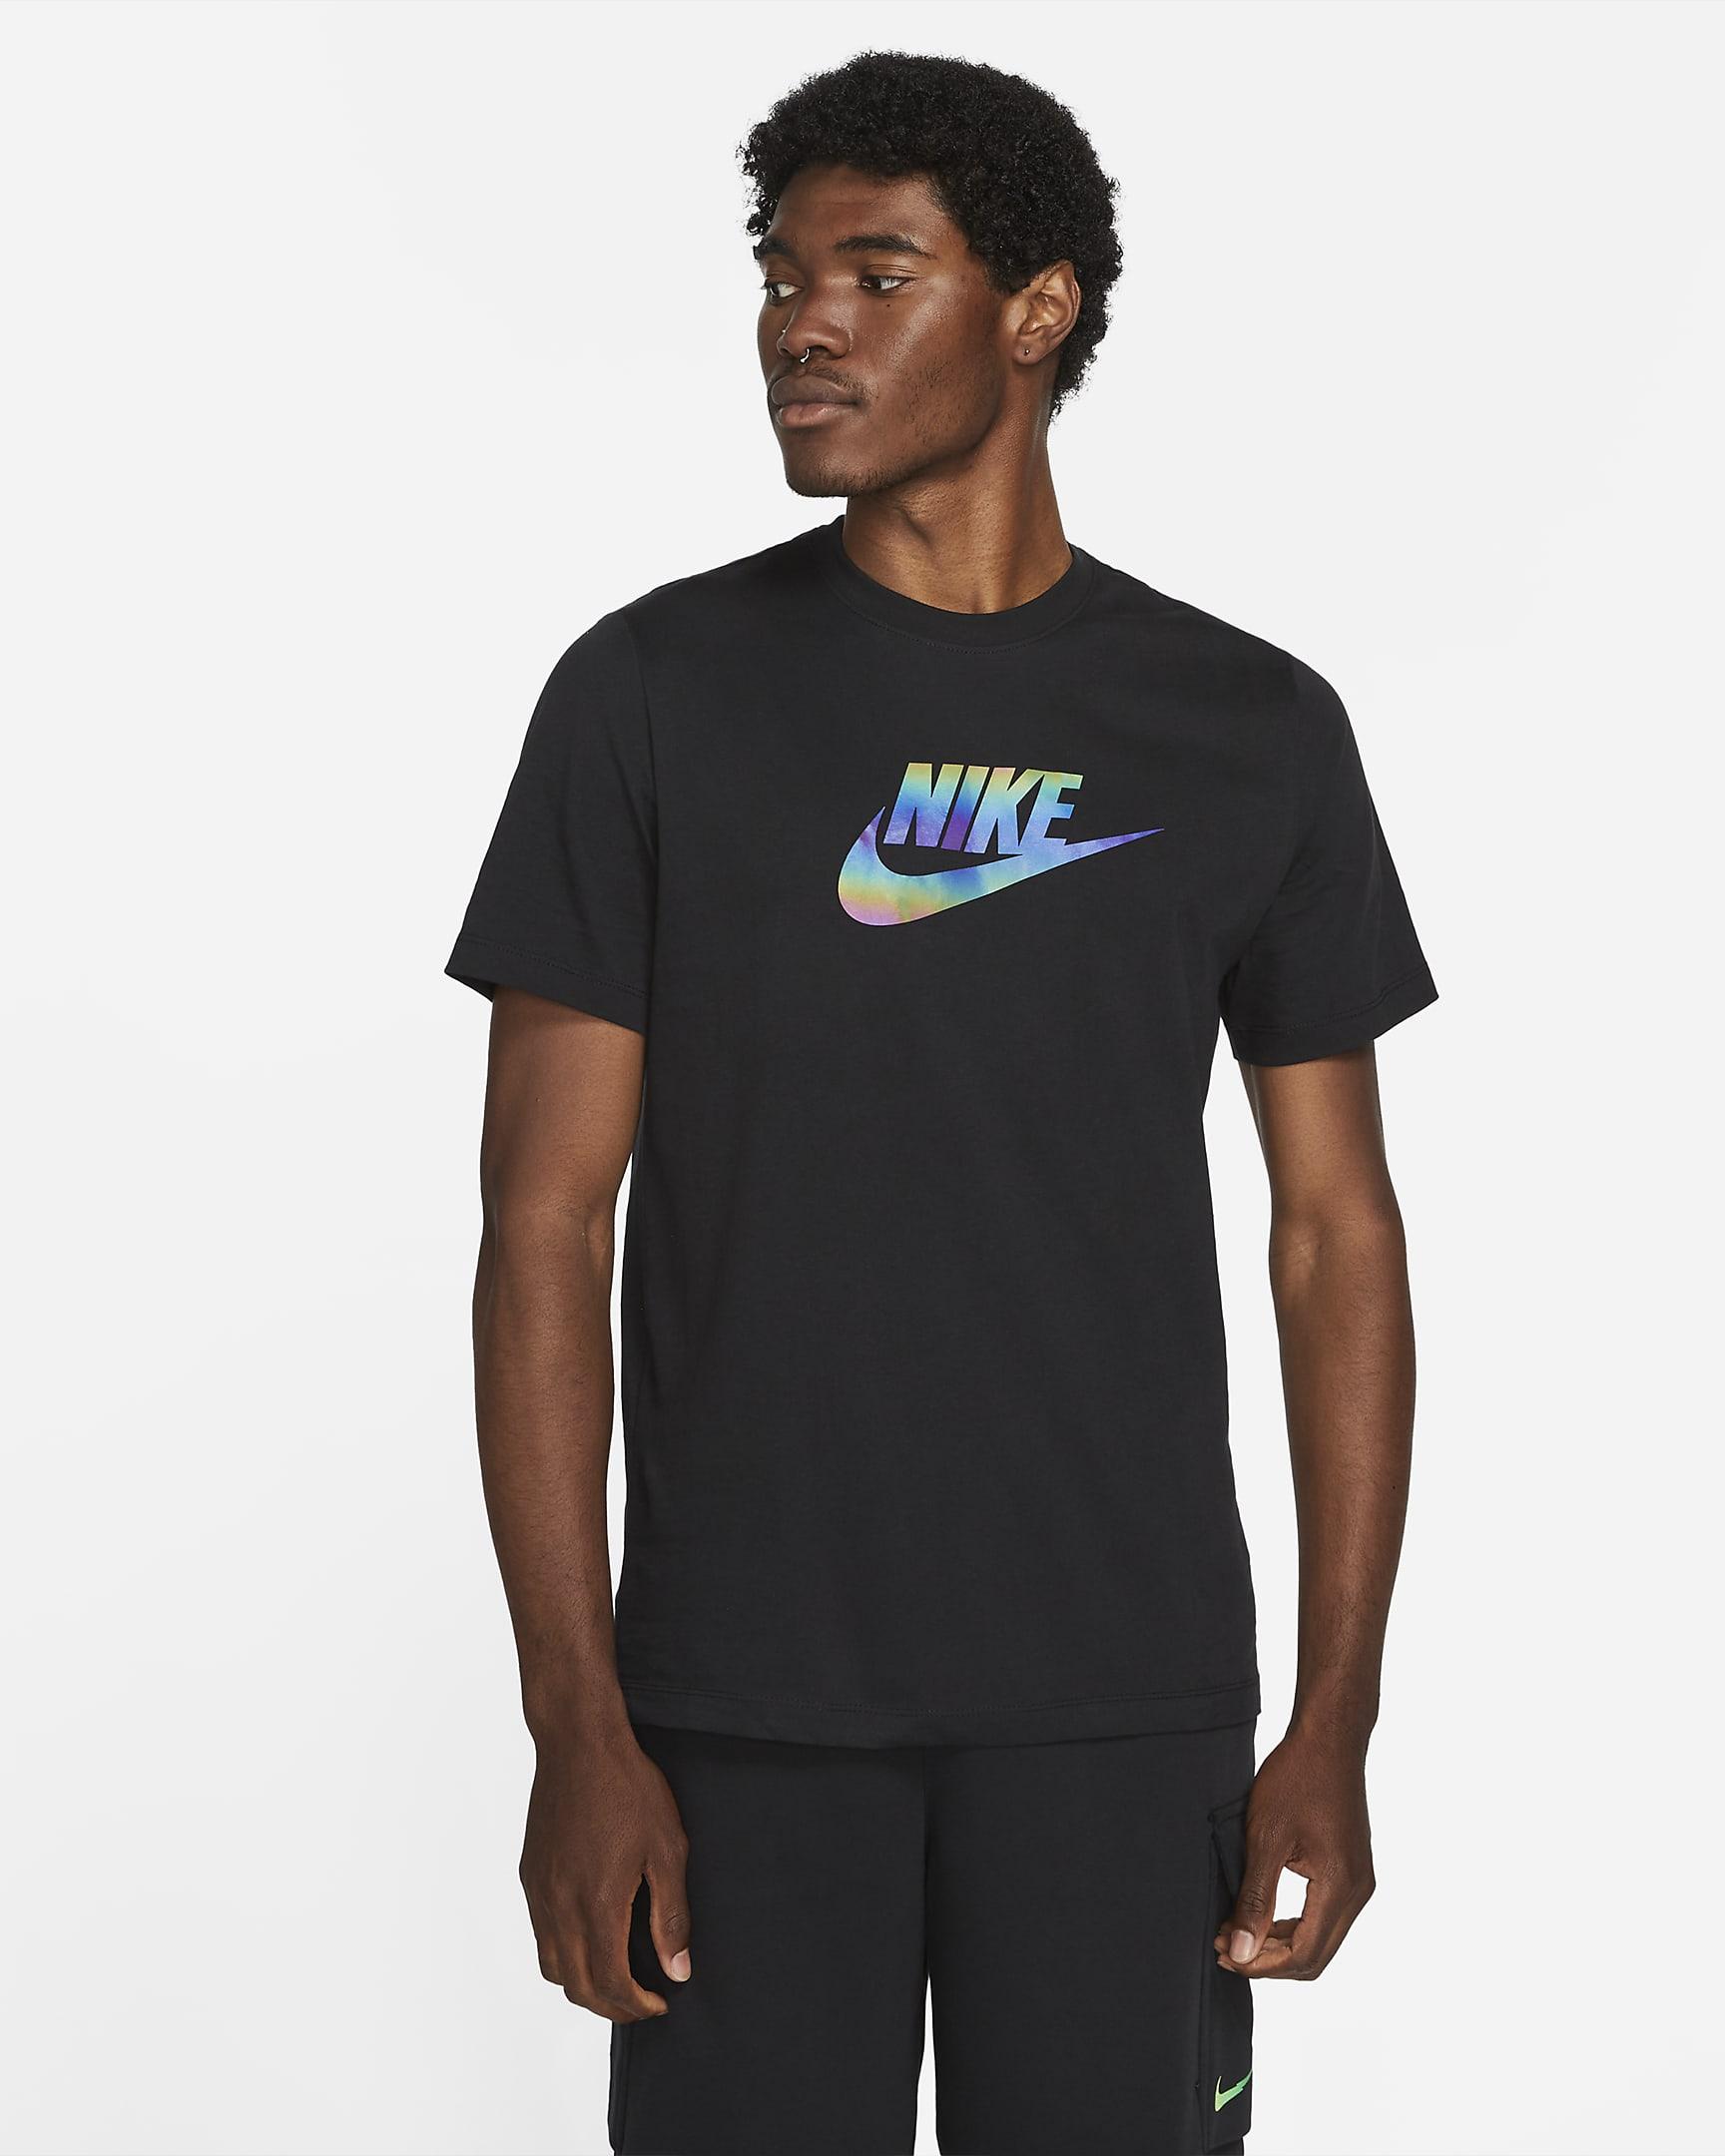 sportswear-mens-t-shirt-50pRvS.png